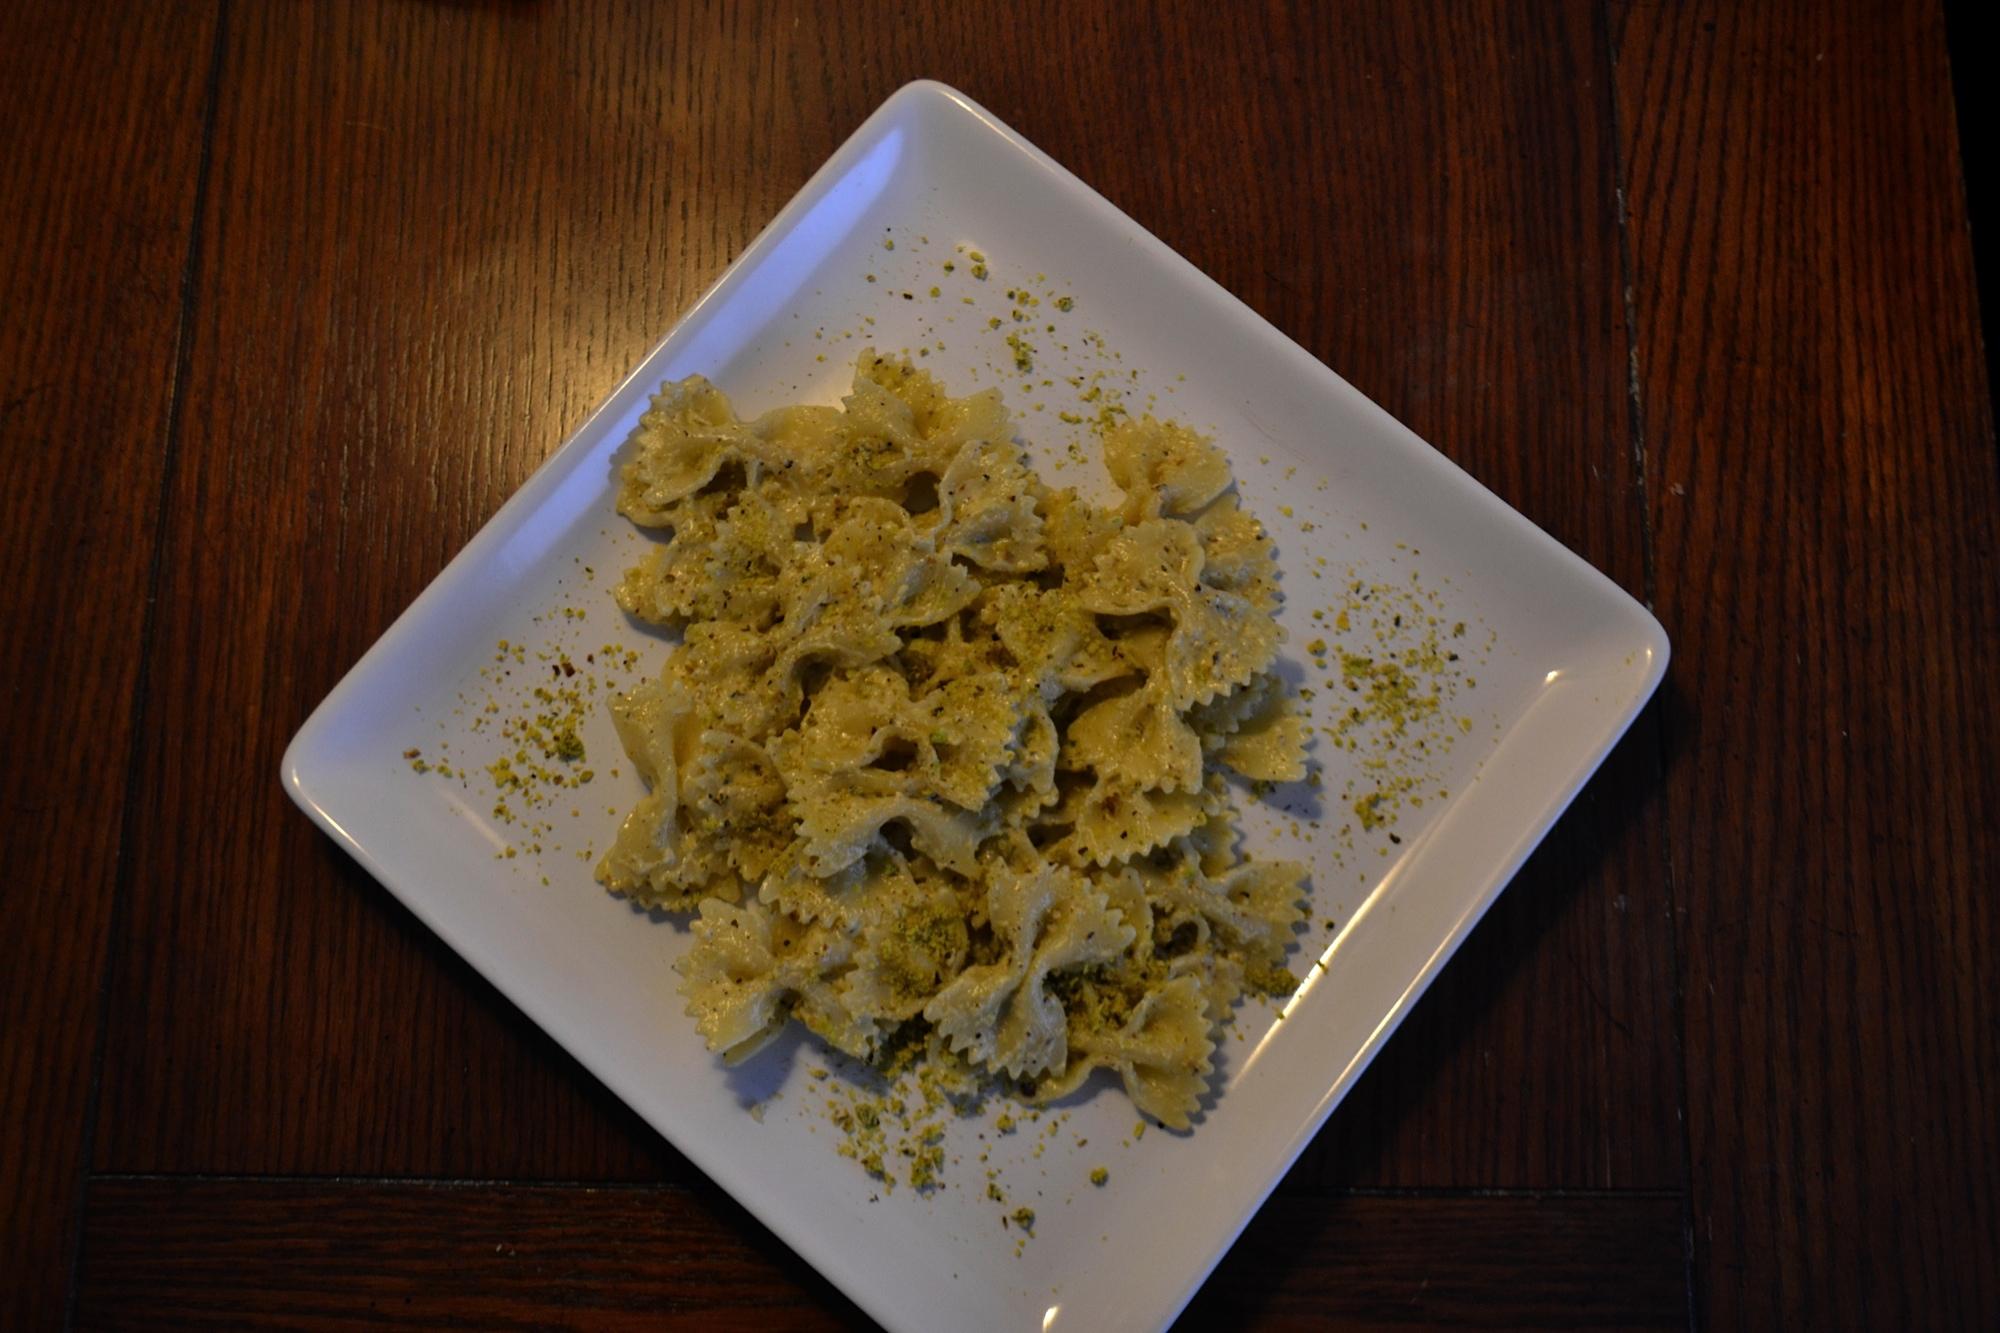 yummly creamy mushroom sauce farfalle with pistachio cream sauce ...